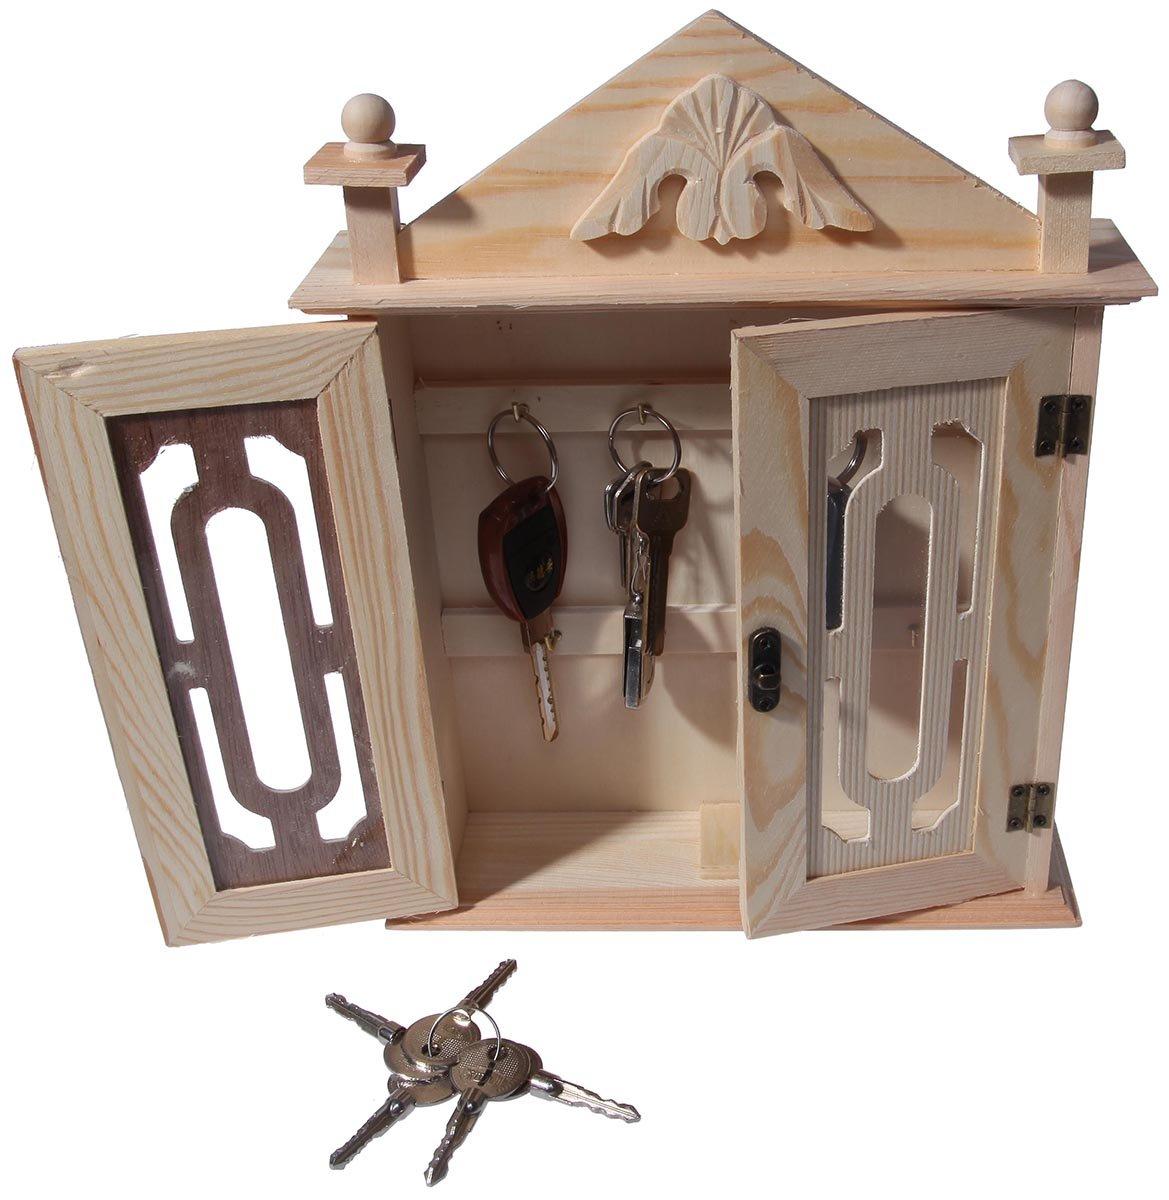 Juvale Key Organizer//Key Cabinet 11 Inches Natural Wood Key Storage Cabinet